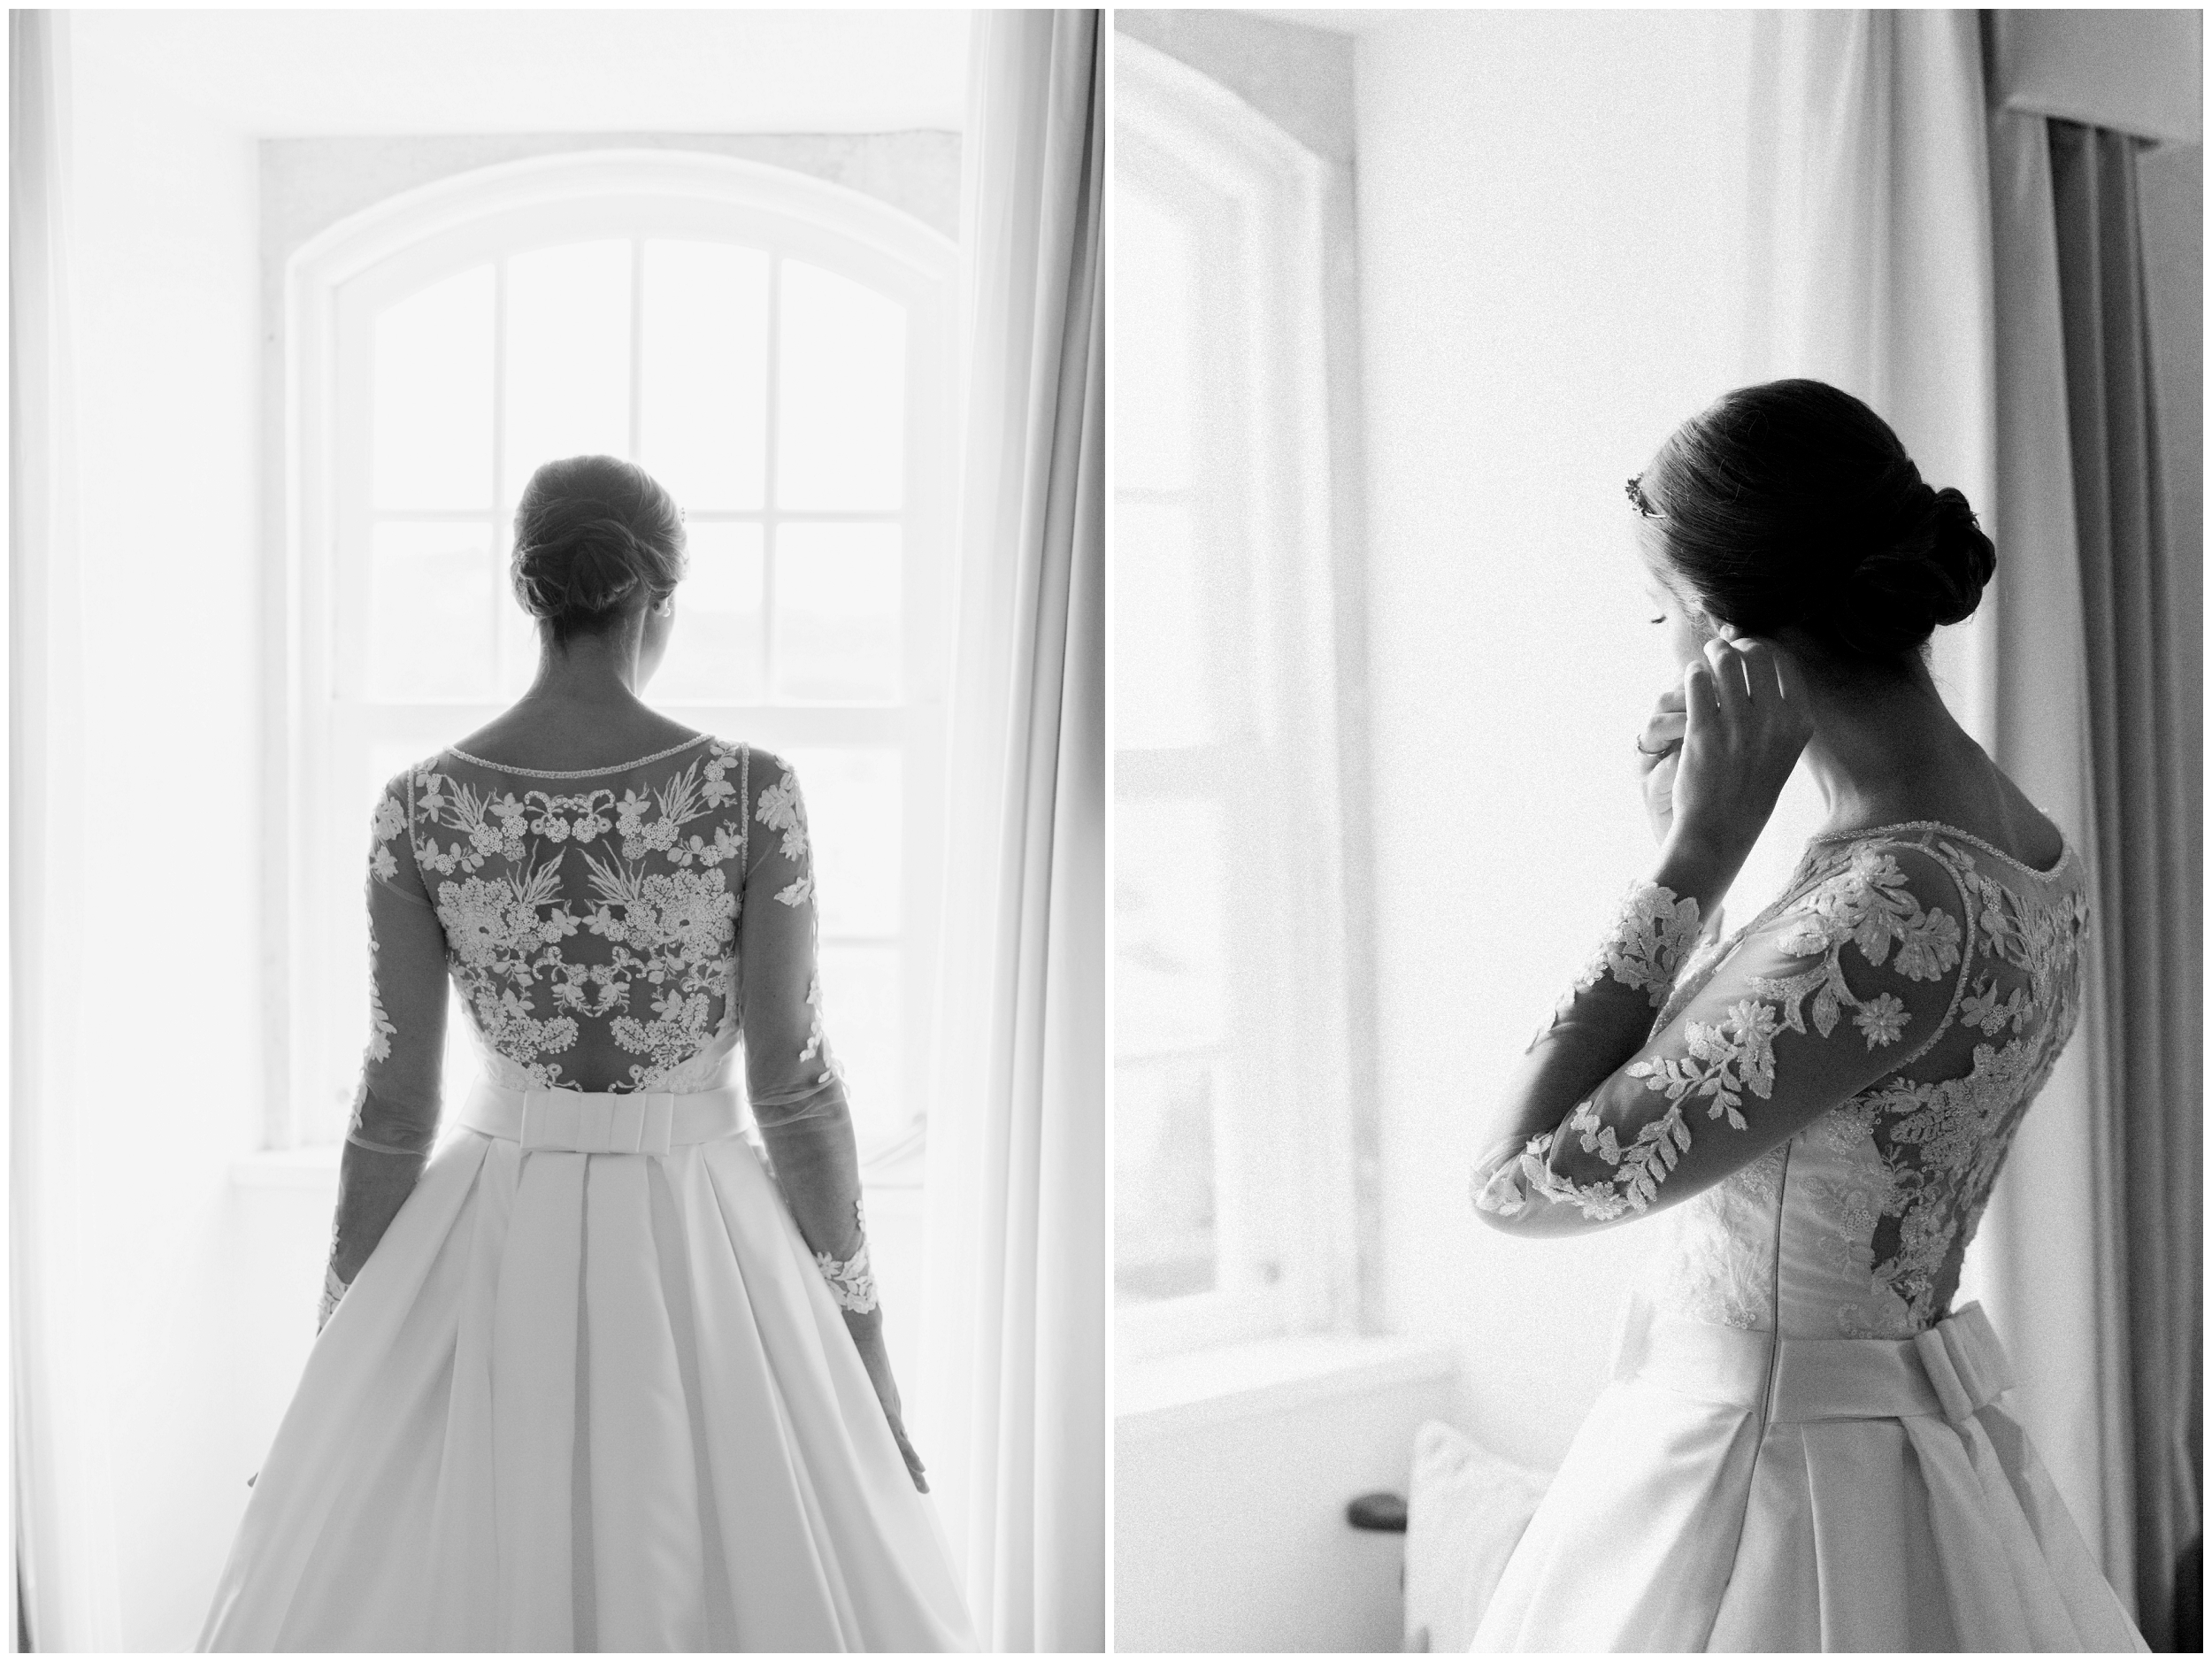 maria+rao+photography+wedding+palacio+lousa_0004.jpg